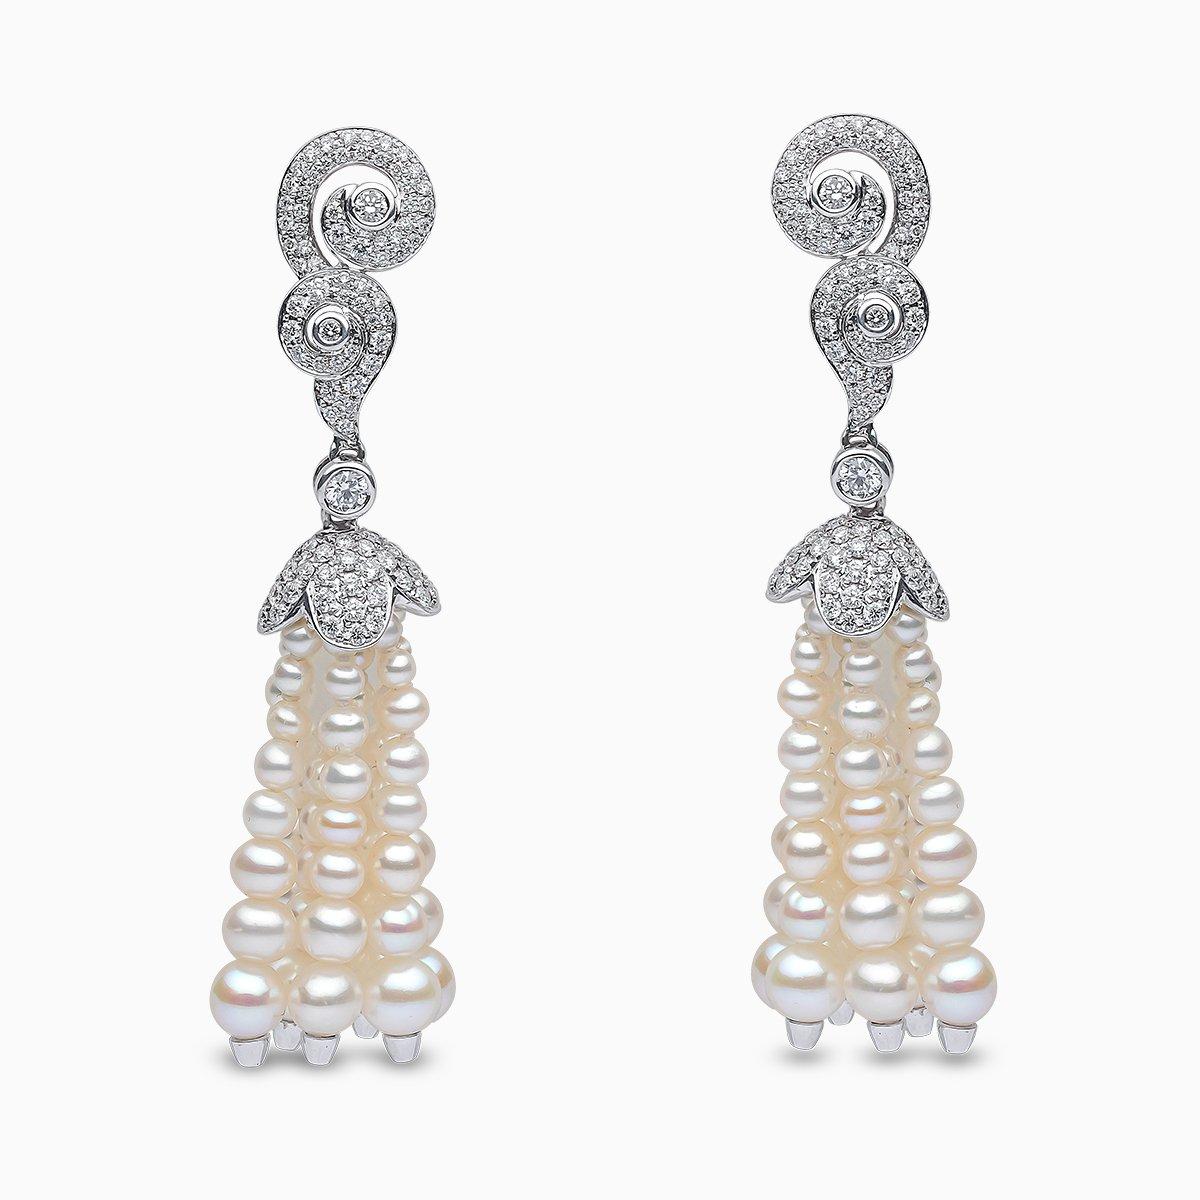 Yoko London Tassel Diamond and Freshwater Pearl Earrings